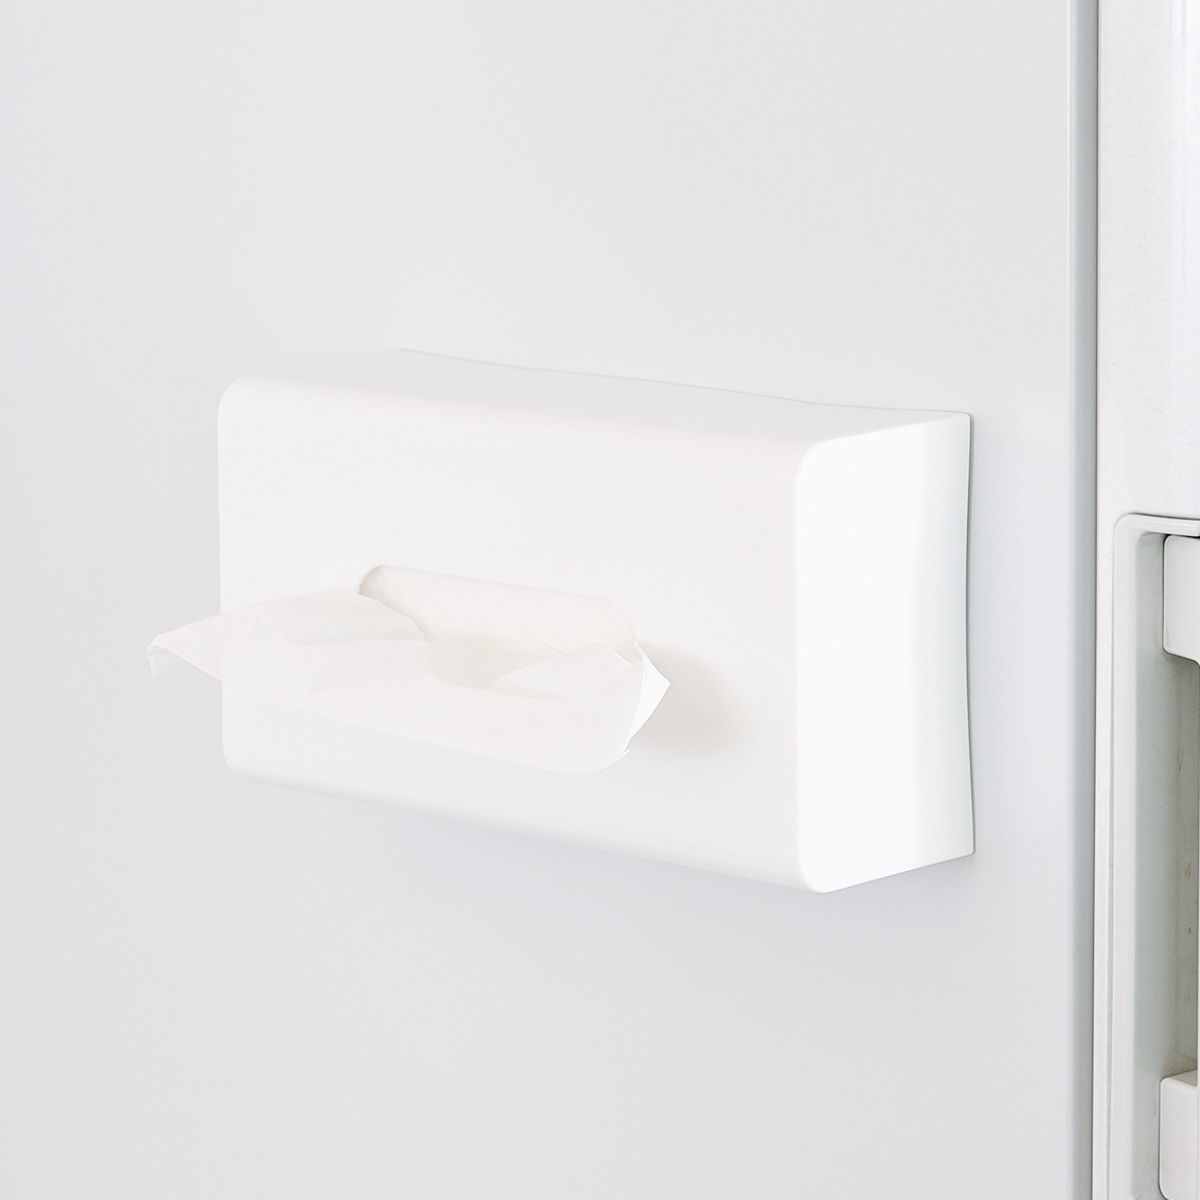 Tissue Holder Magnetboxtish Mag On Magnet Fridge Storage Box Paper Kitchen Beside